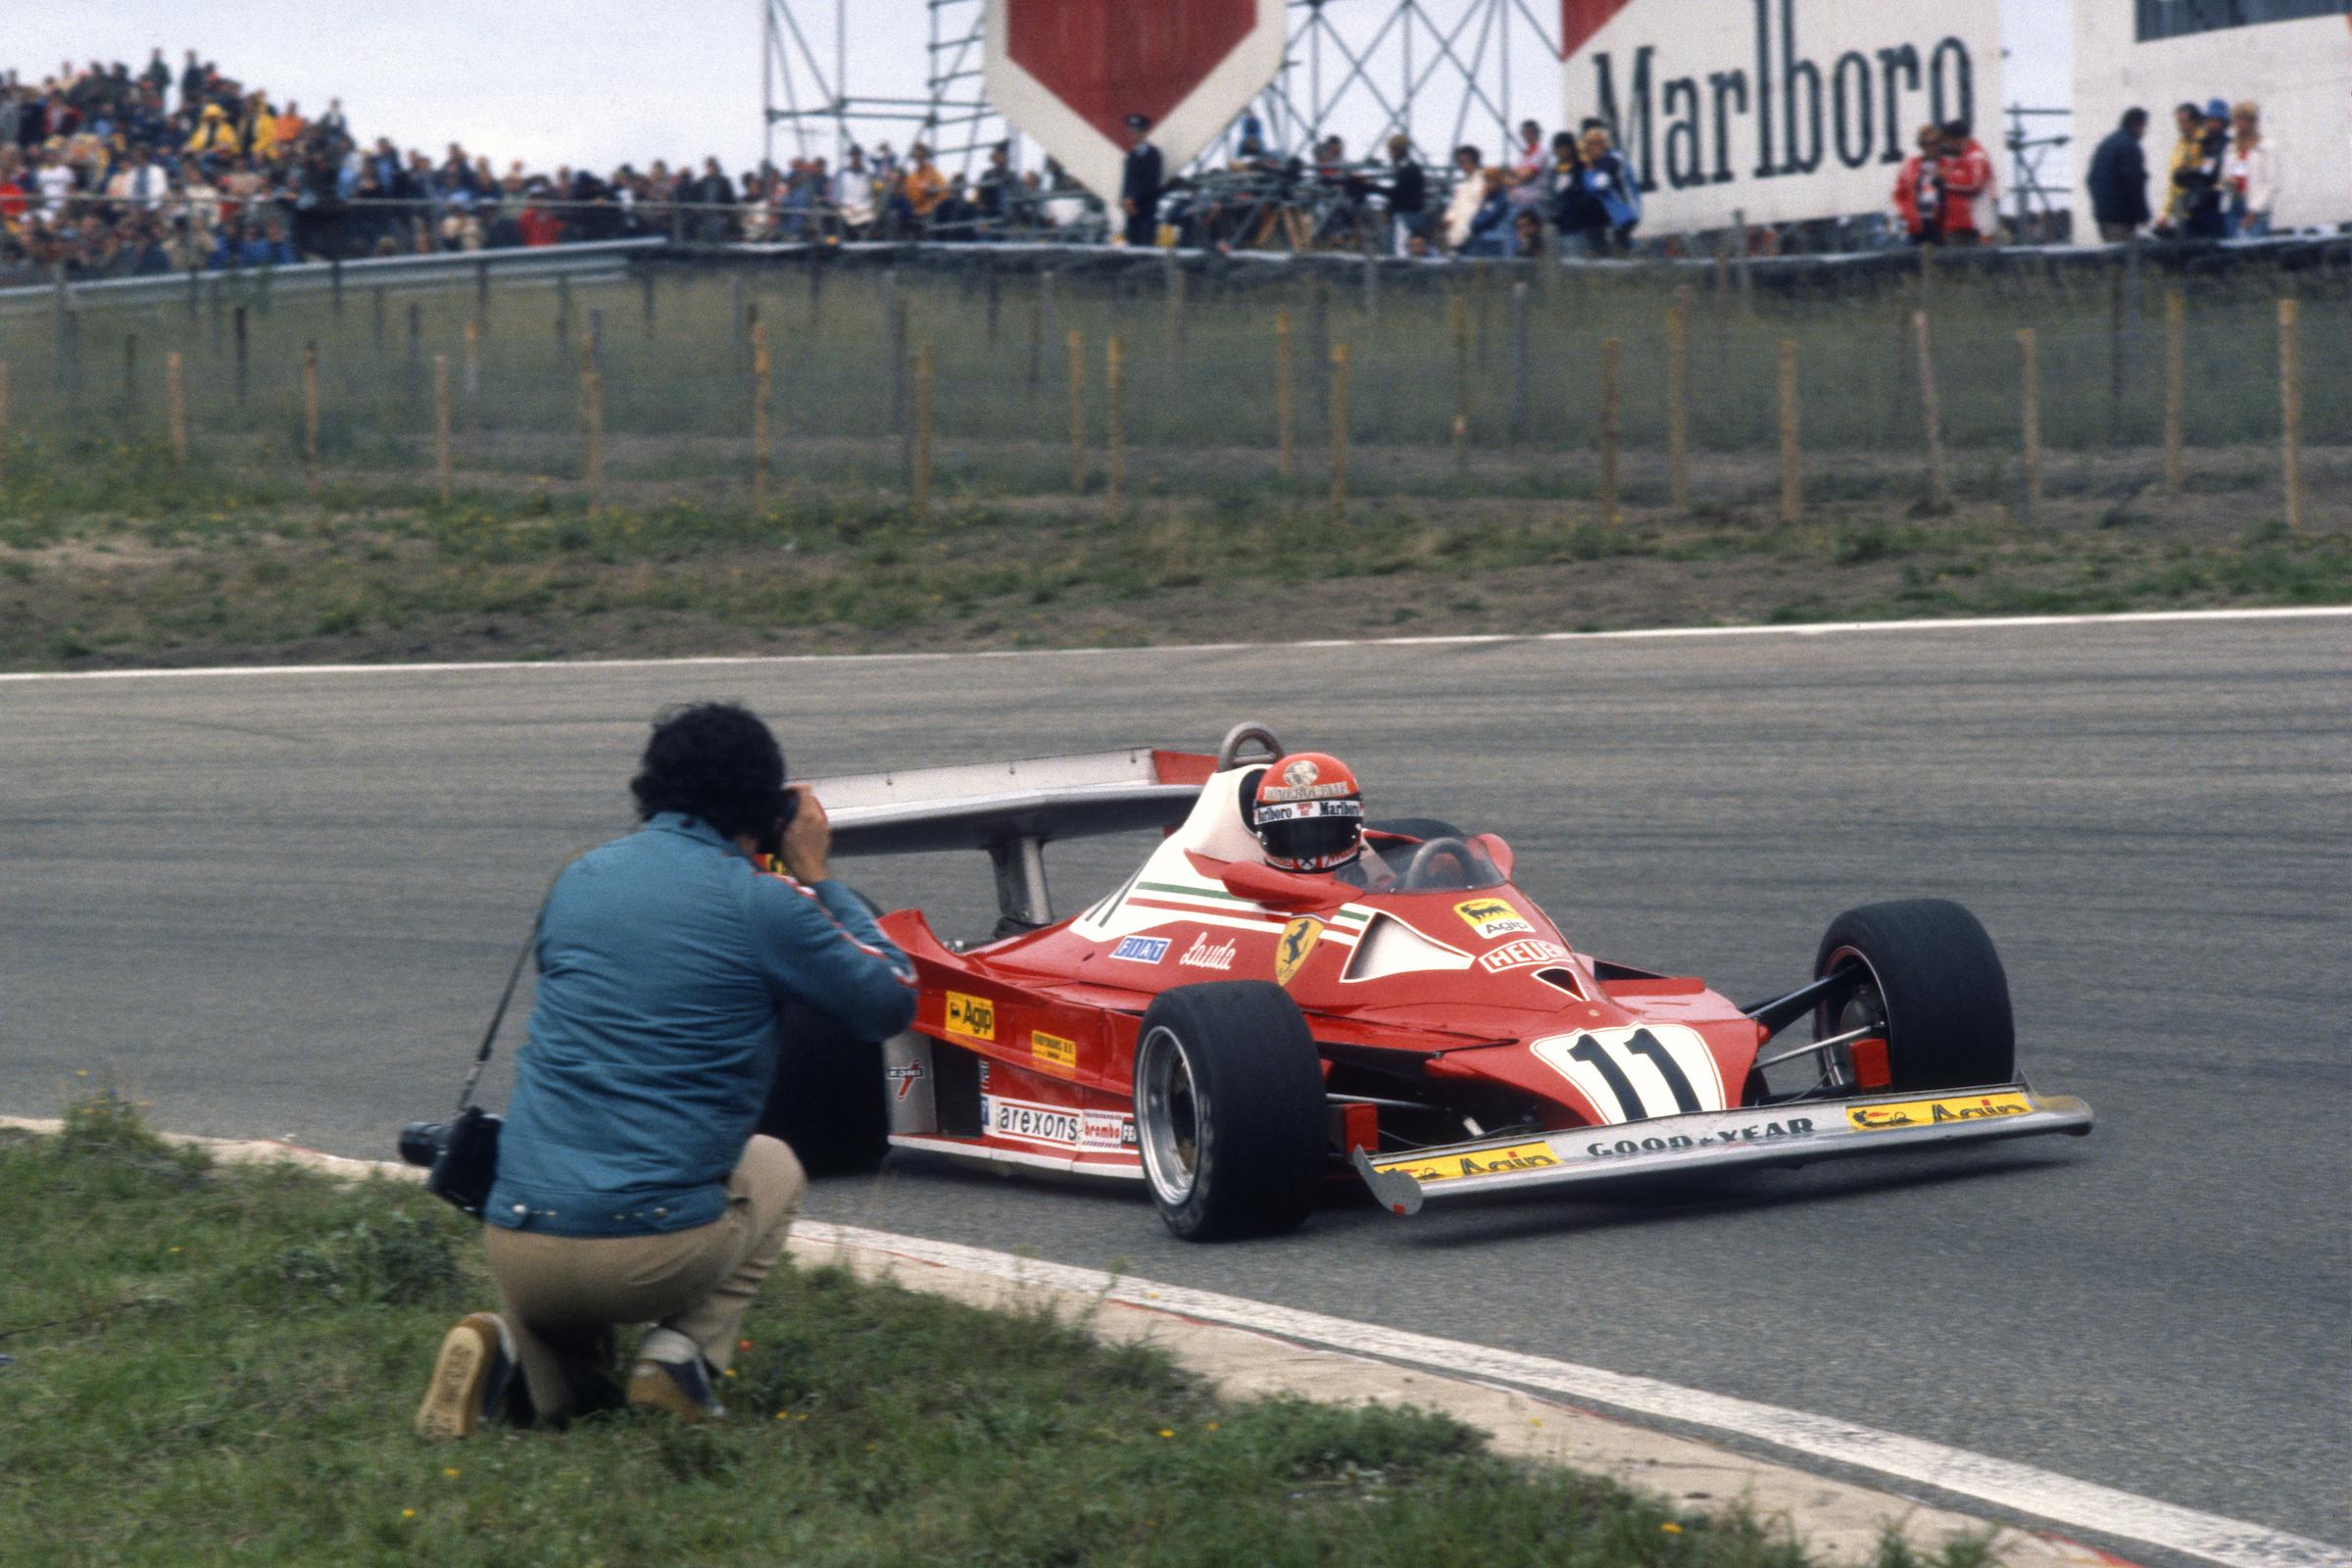 Niki Lauda Ferrari Japanese Grand Prix 1977